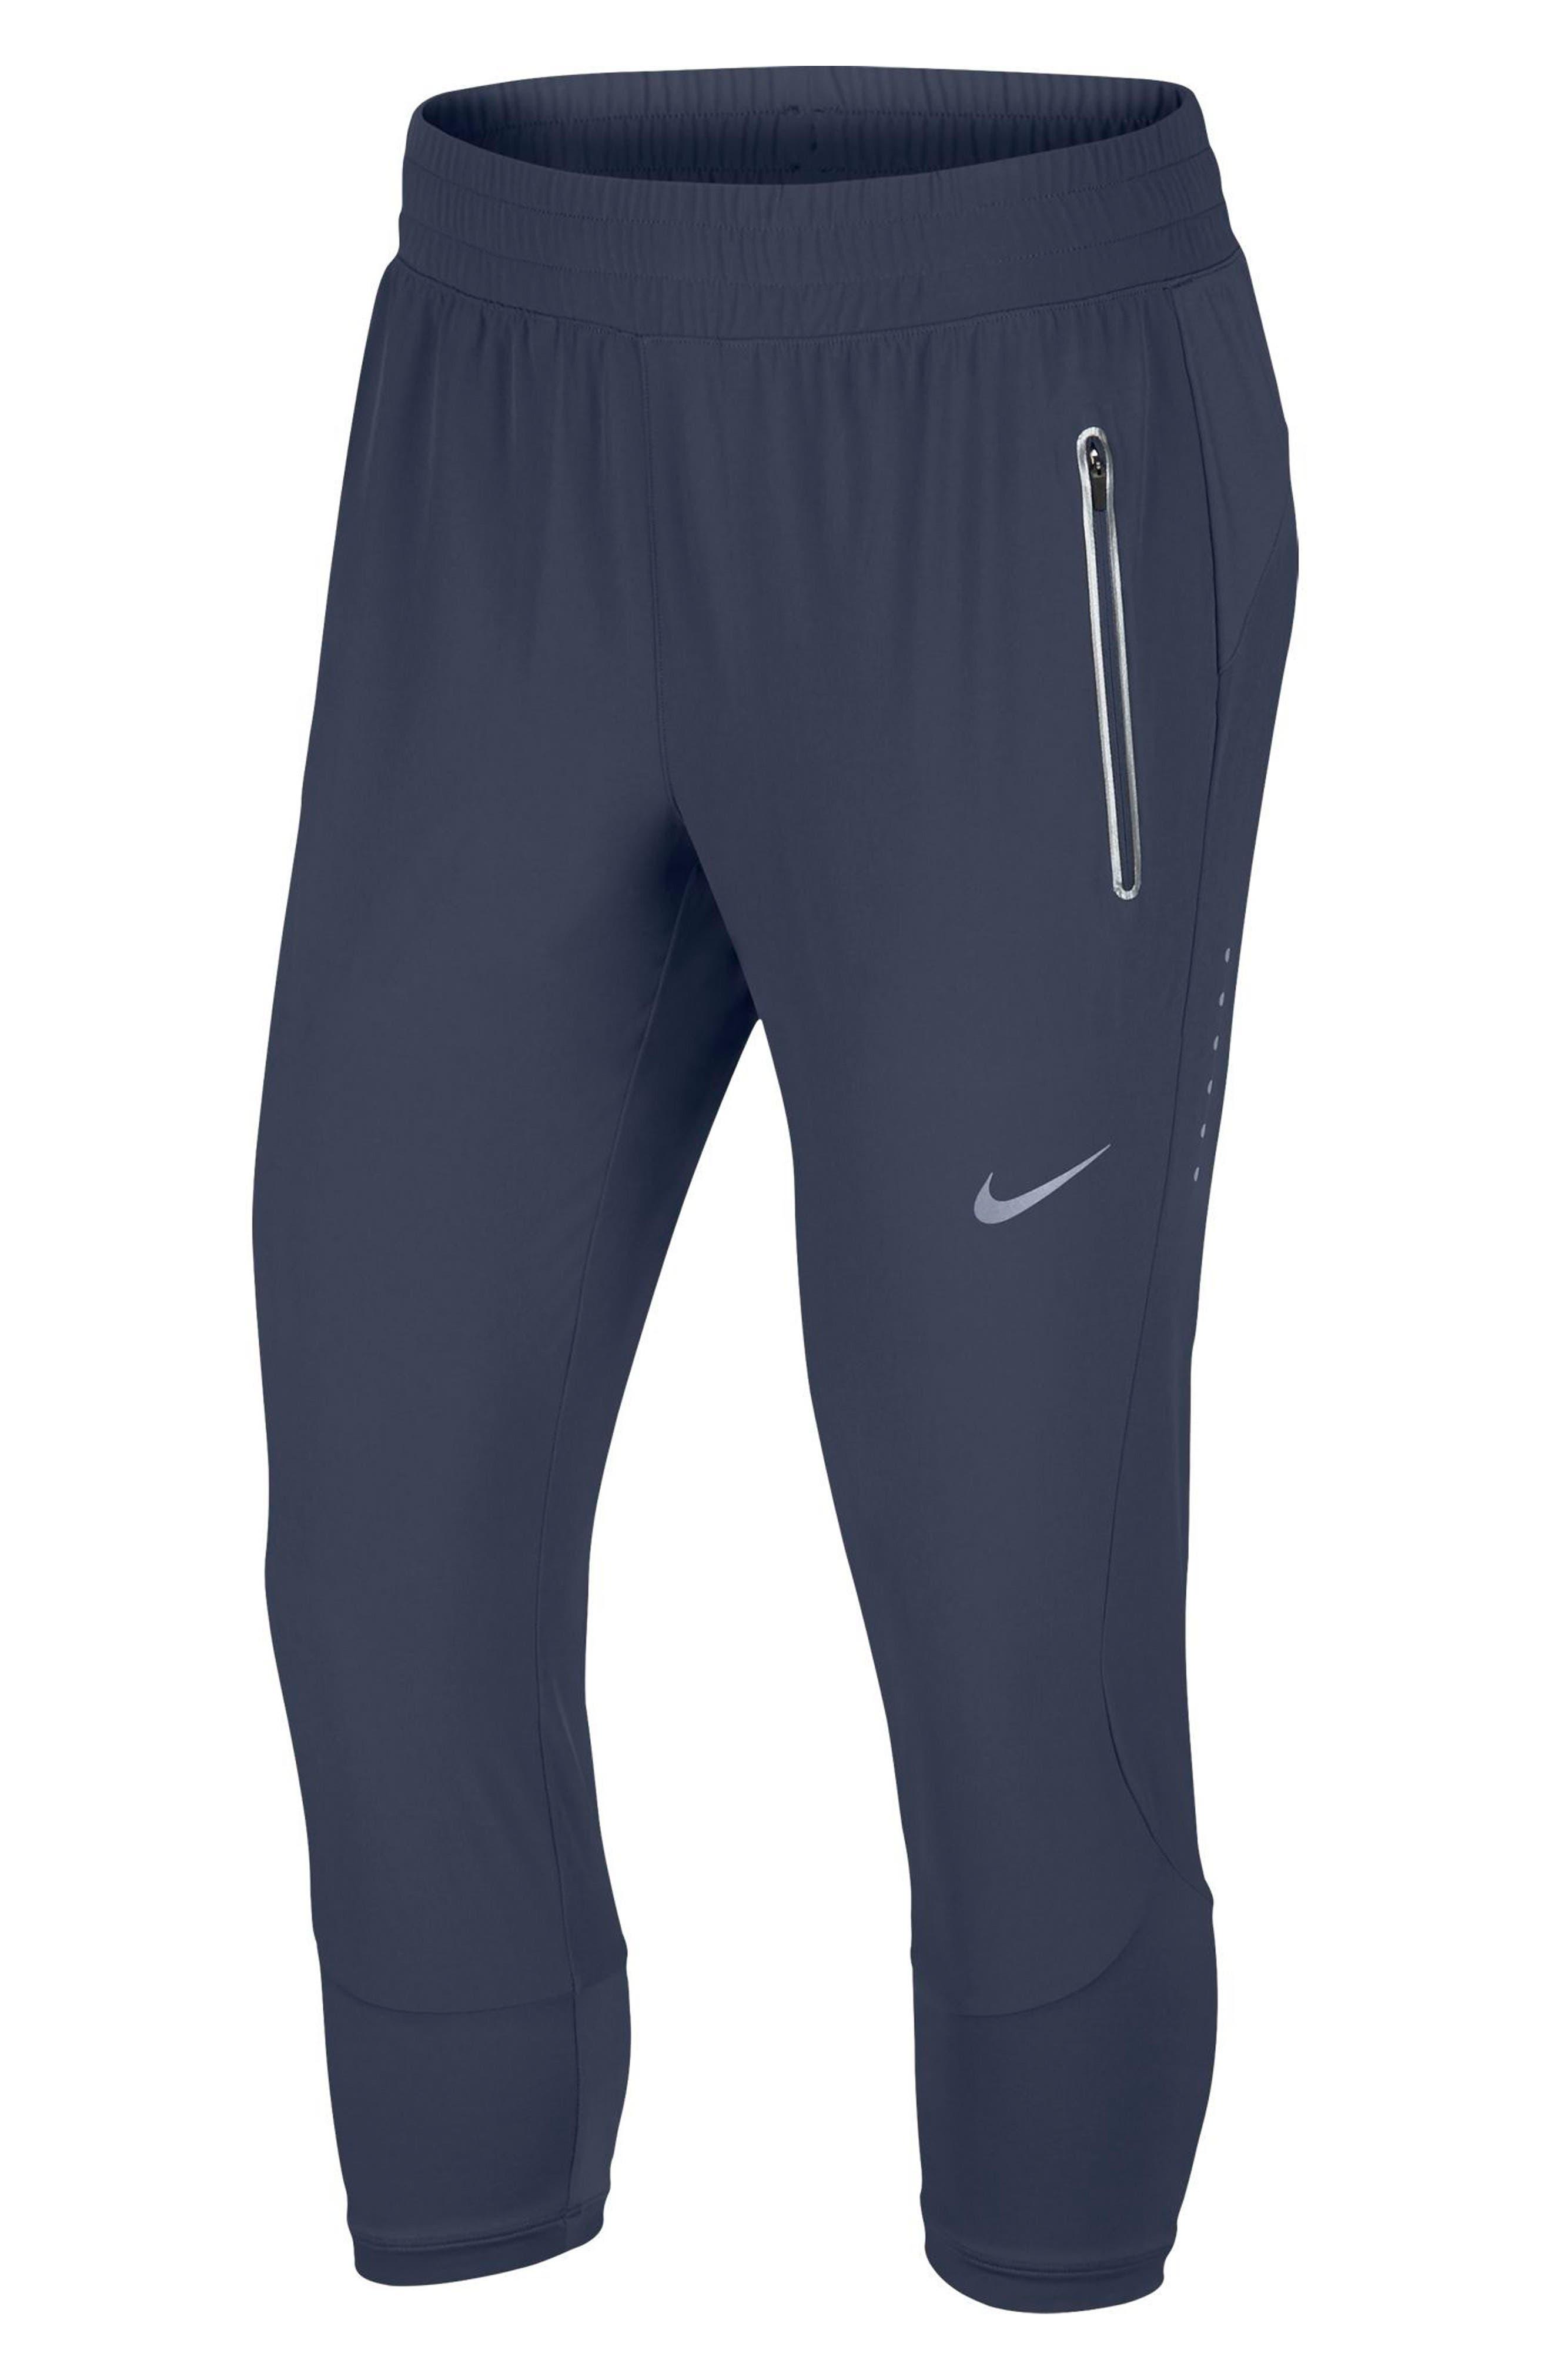 Main Image - Nike Women's Flex Swift Running Crop Pants